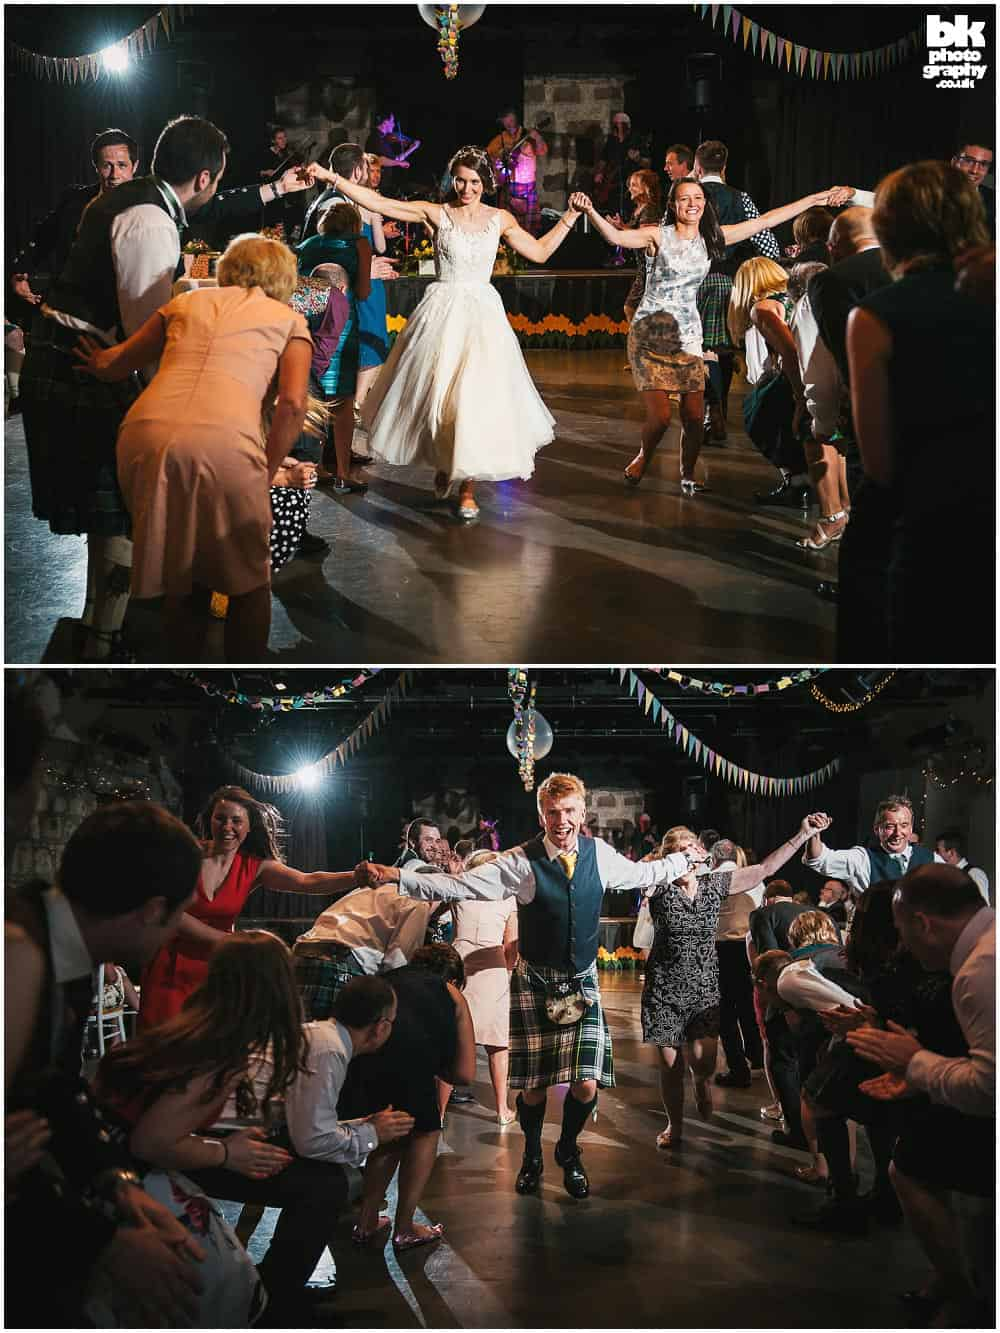 BK Photography, Scotland Wedding Photographer